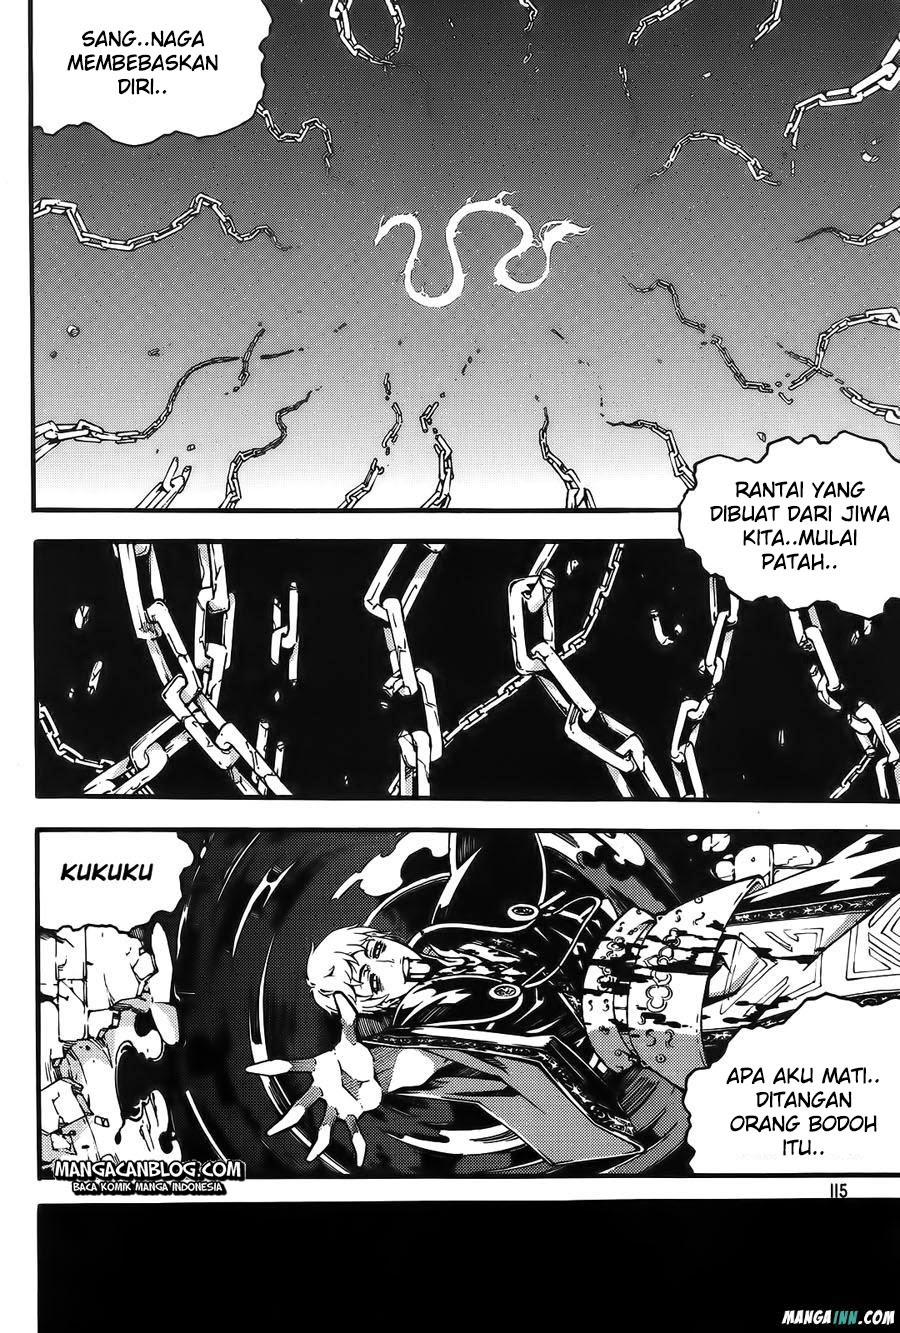 Dilarang COPAS - situs resmi www.mangacanblog.com - Komik witch hunter 071 - selamat tinggal kakak 72 Indonesia witch hunter 071 - selamat tinggal kakak Terbaru 4|Baca Manga Komik Indonesia|Mangacan